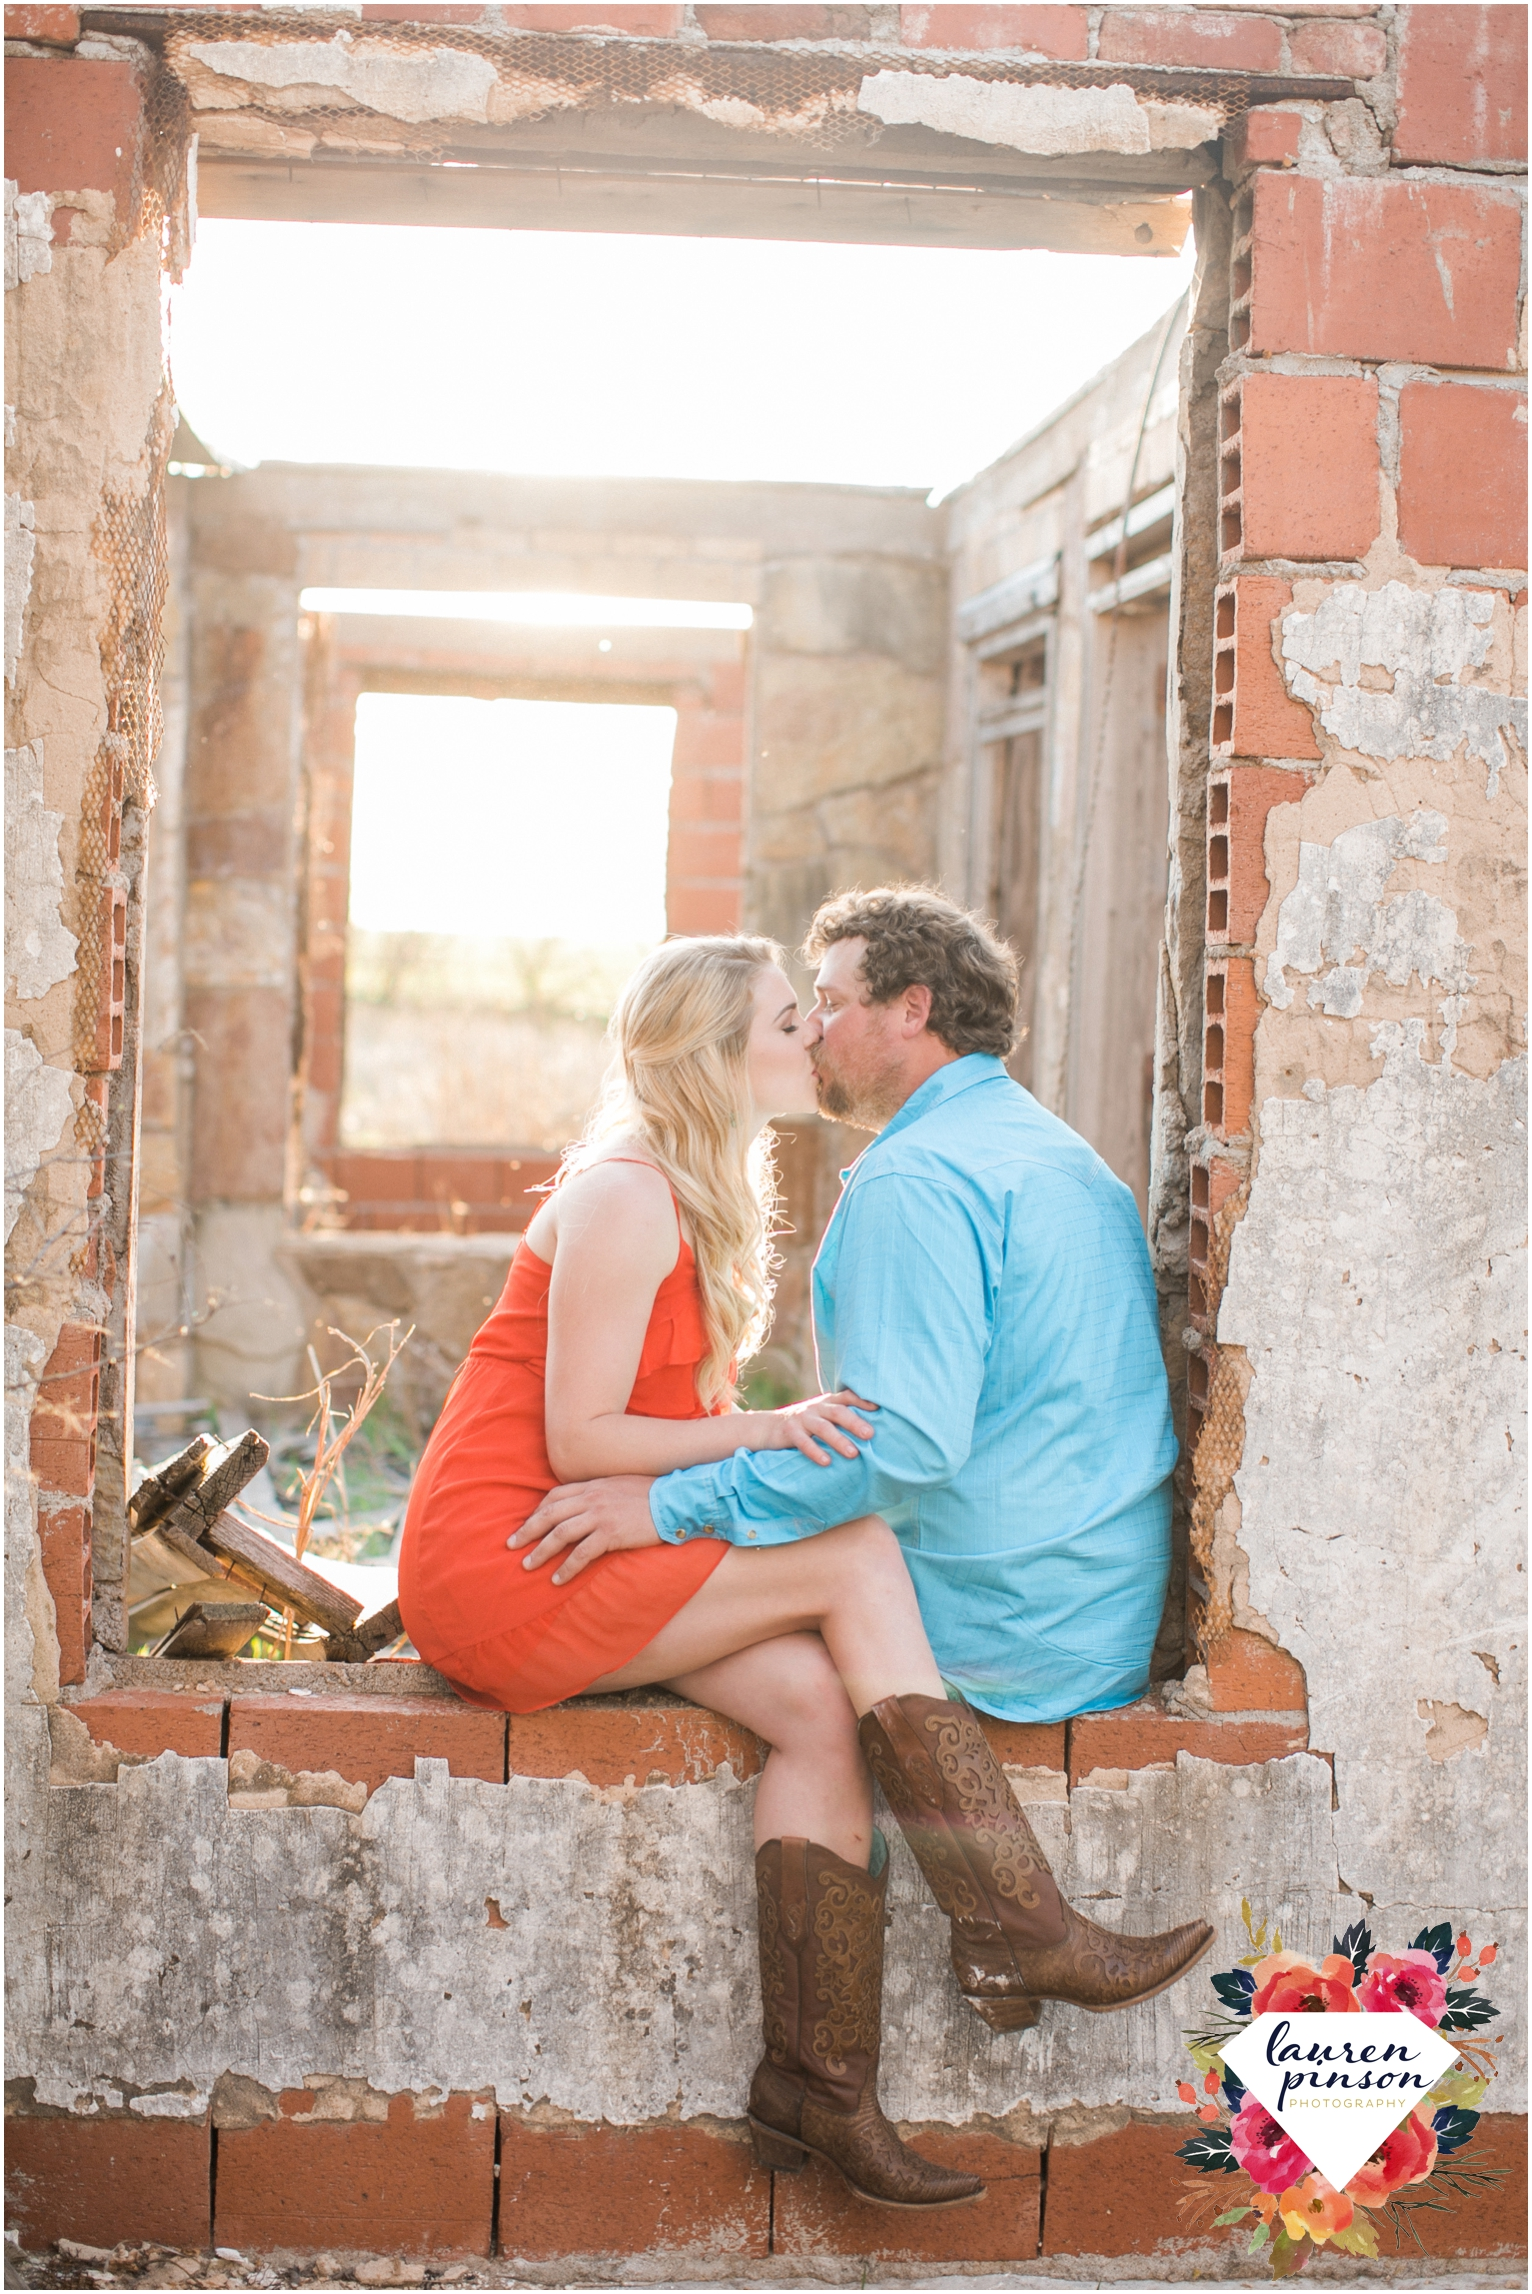 wichita-falls-wedding-photographer-engagement-session-texas-photography-oklahoma-engagement-wedding-photography_0636.jpg